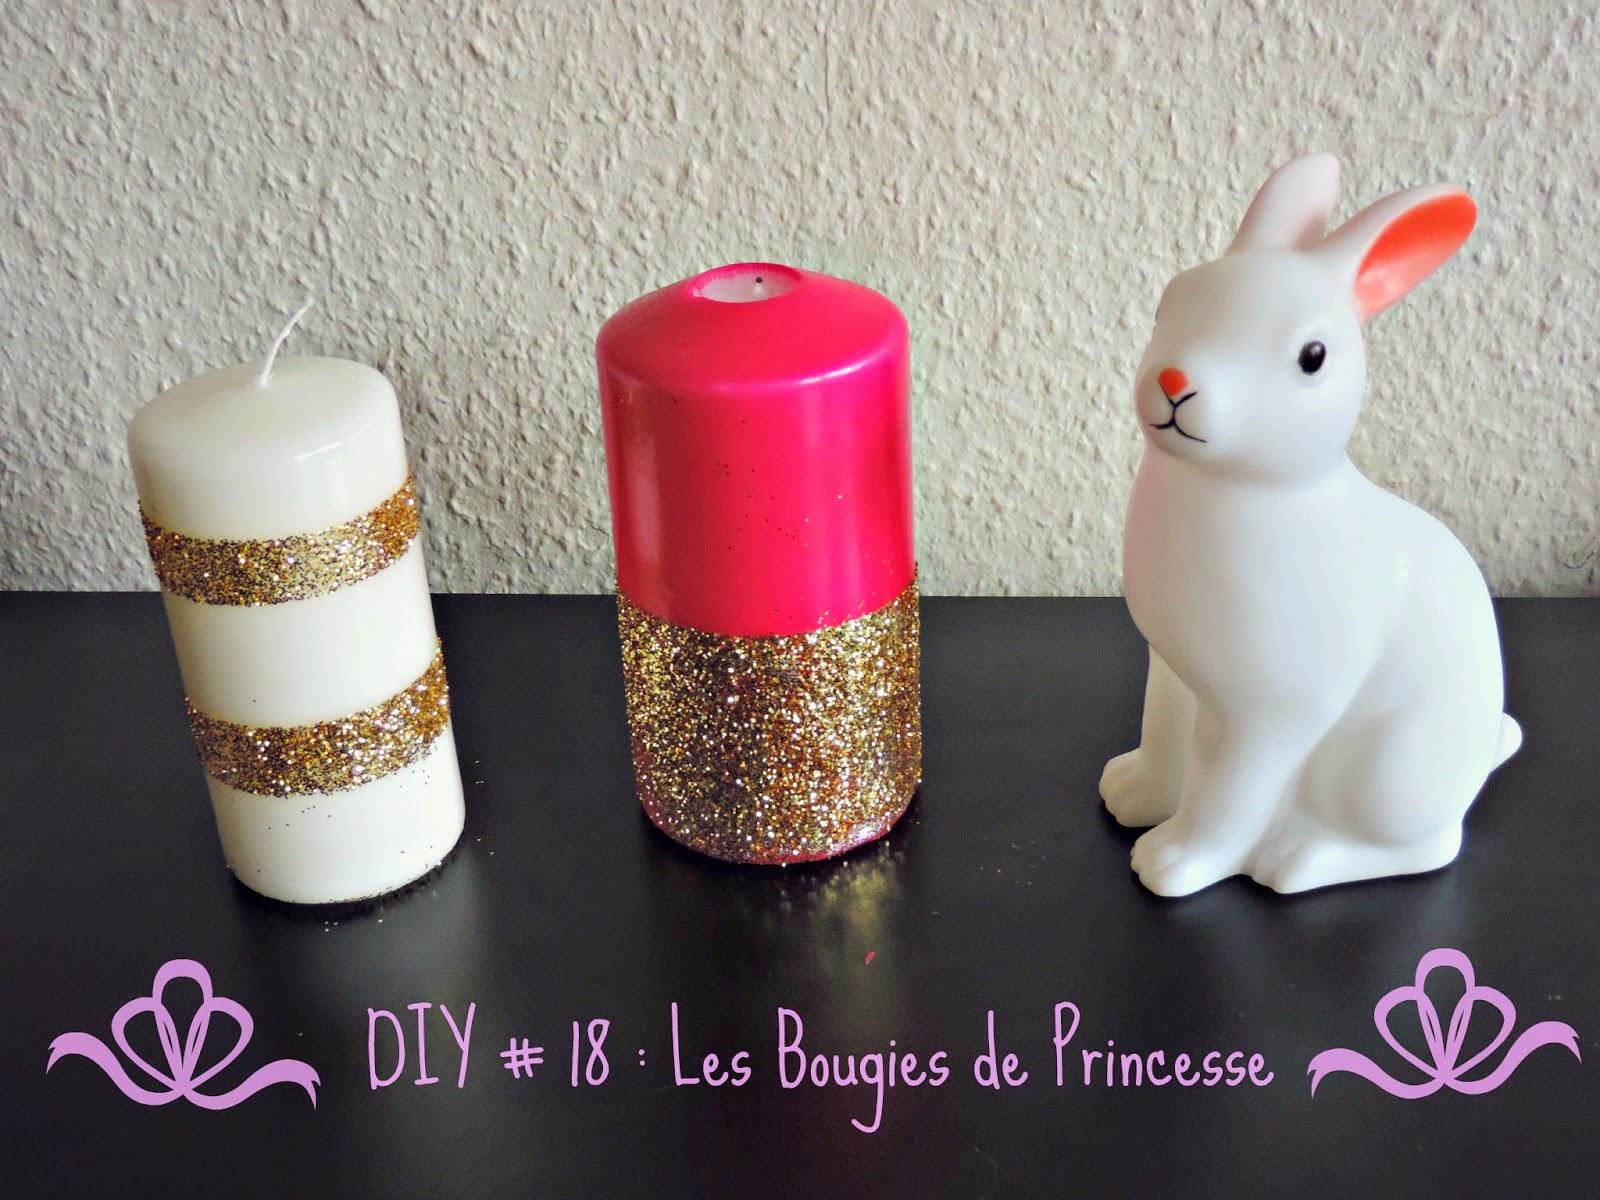 http://mynameisgeorges.blogspot.com/2014/08/diy-18-les-bougies-de-princesse.html